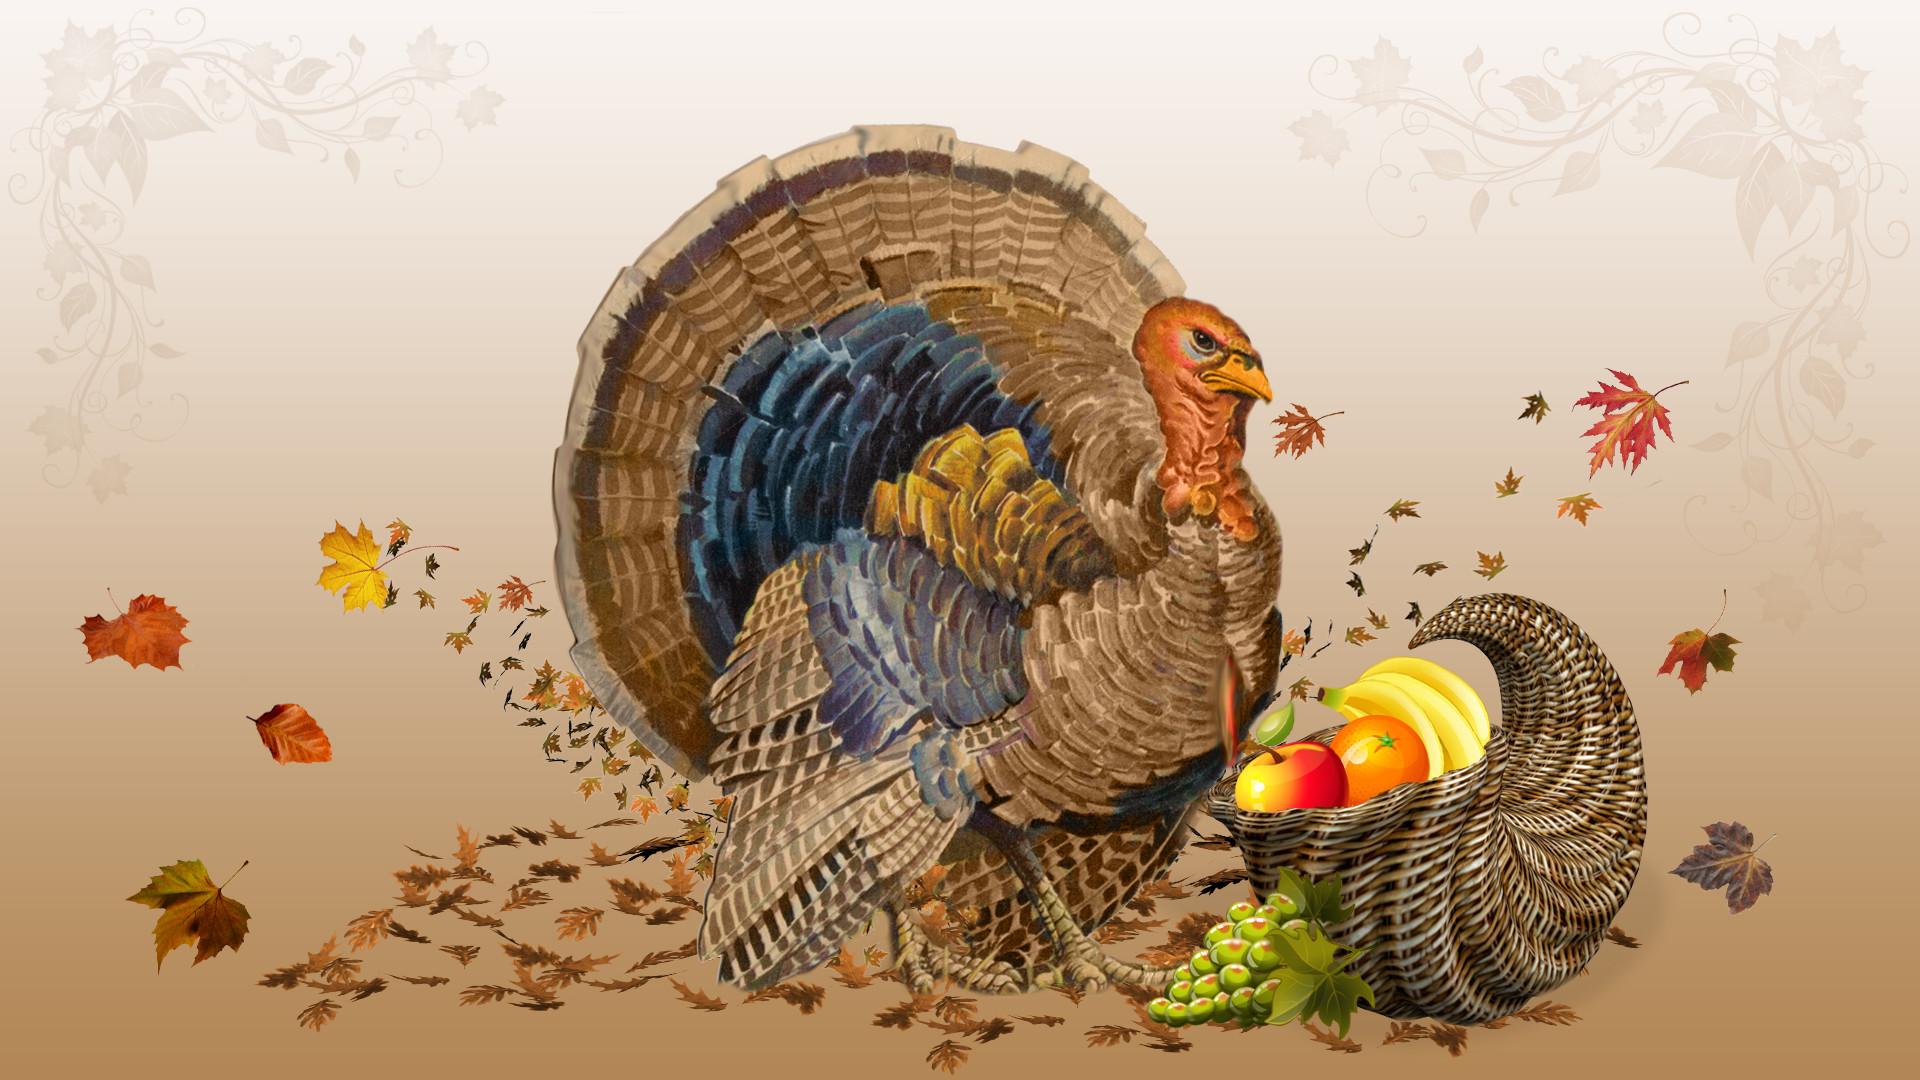 Falling Leaves Wallpaper Screensavers Turkey Wallpaper Thanksgiving 183 ①